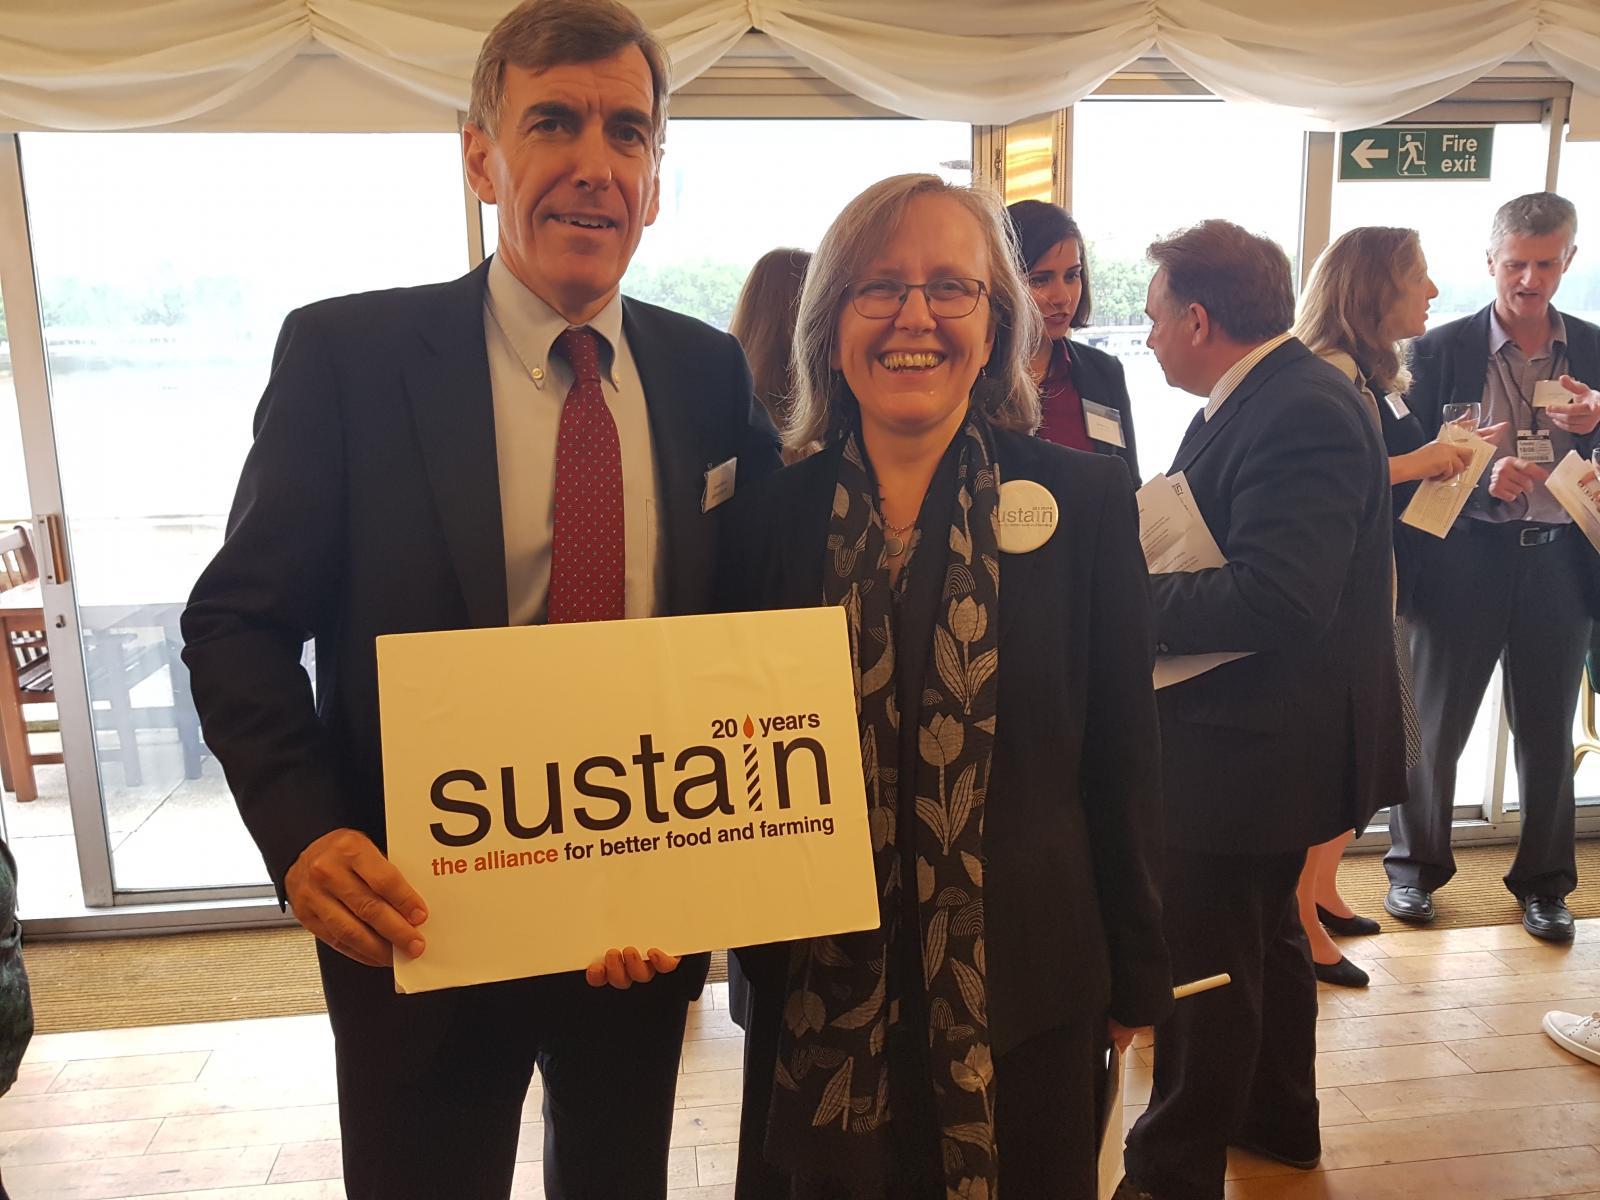 Sustain chief executive Kath Dalmeny with David Rutley MP, Minister for Food and Animal Welfare. Photo credits: Sarah Davenport and Orla Delargy